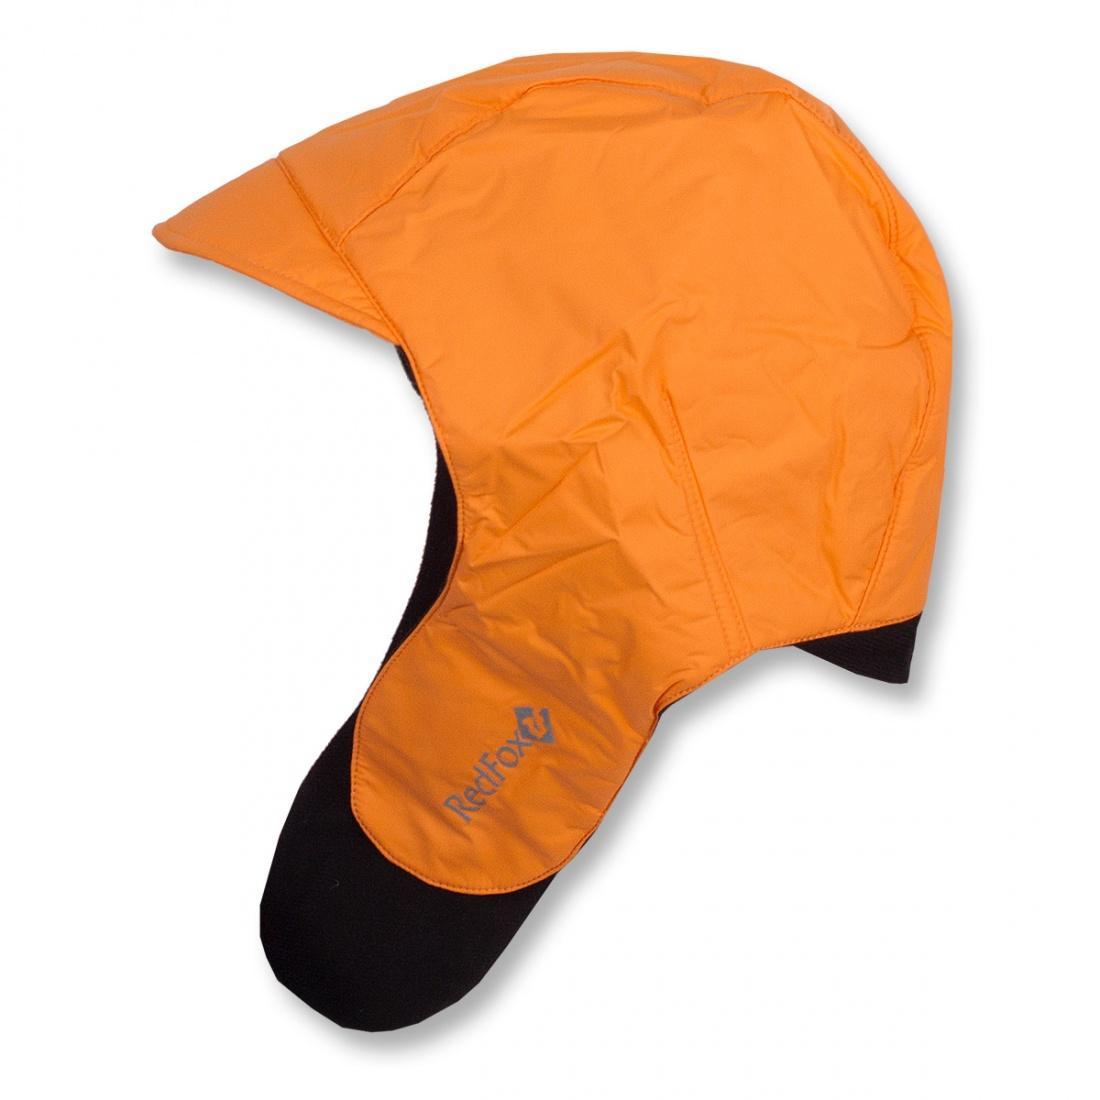 Шапка детская PilotУшанки<br><br> Удобная стильная шапочка для детей от года. <br><br> <br><br><br><br> Материал – Dry Factor 1000.<br><br> <br><br><br> Утеплитель – Omniterm Classic.<br><br> <br><br><br> Облегающий крой.<br><br> <br><br>...<br><br>Цвет: Оранжевый<br>Размер: M